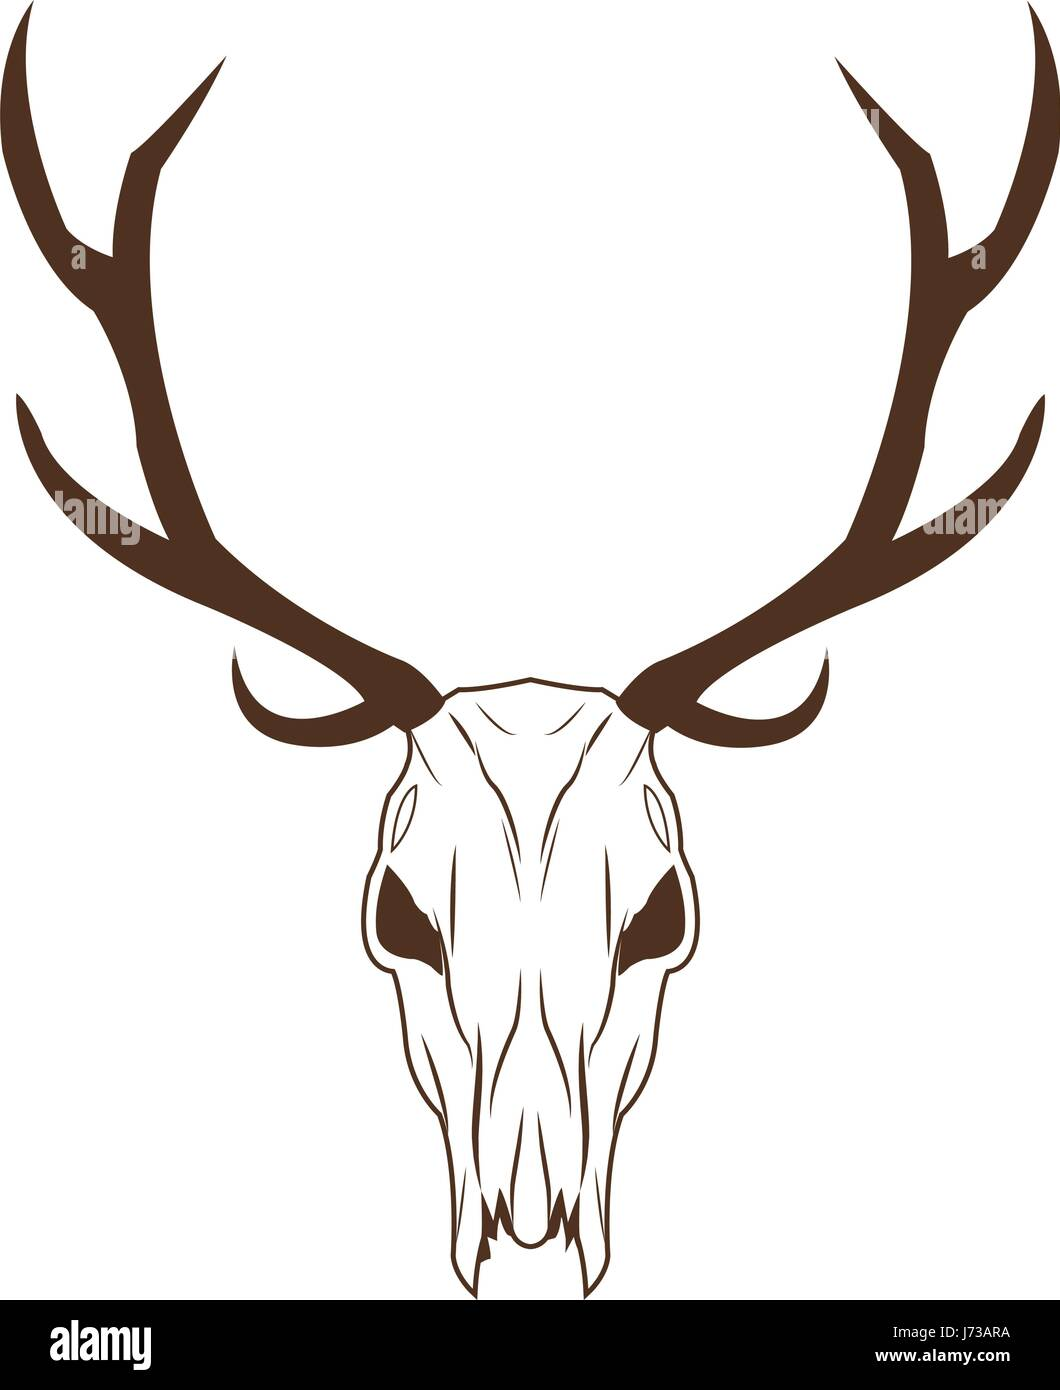 Deer Skull In Tribal Style Animal Skull With Ethnic